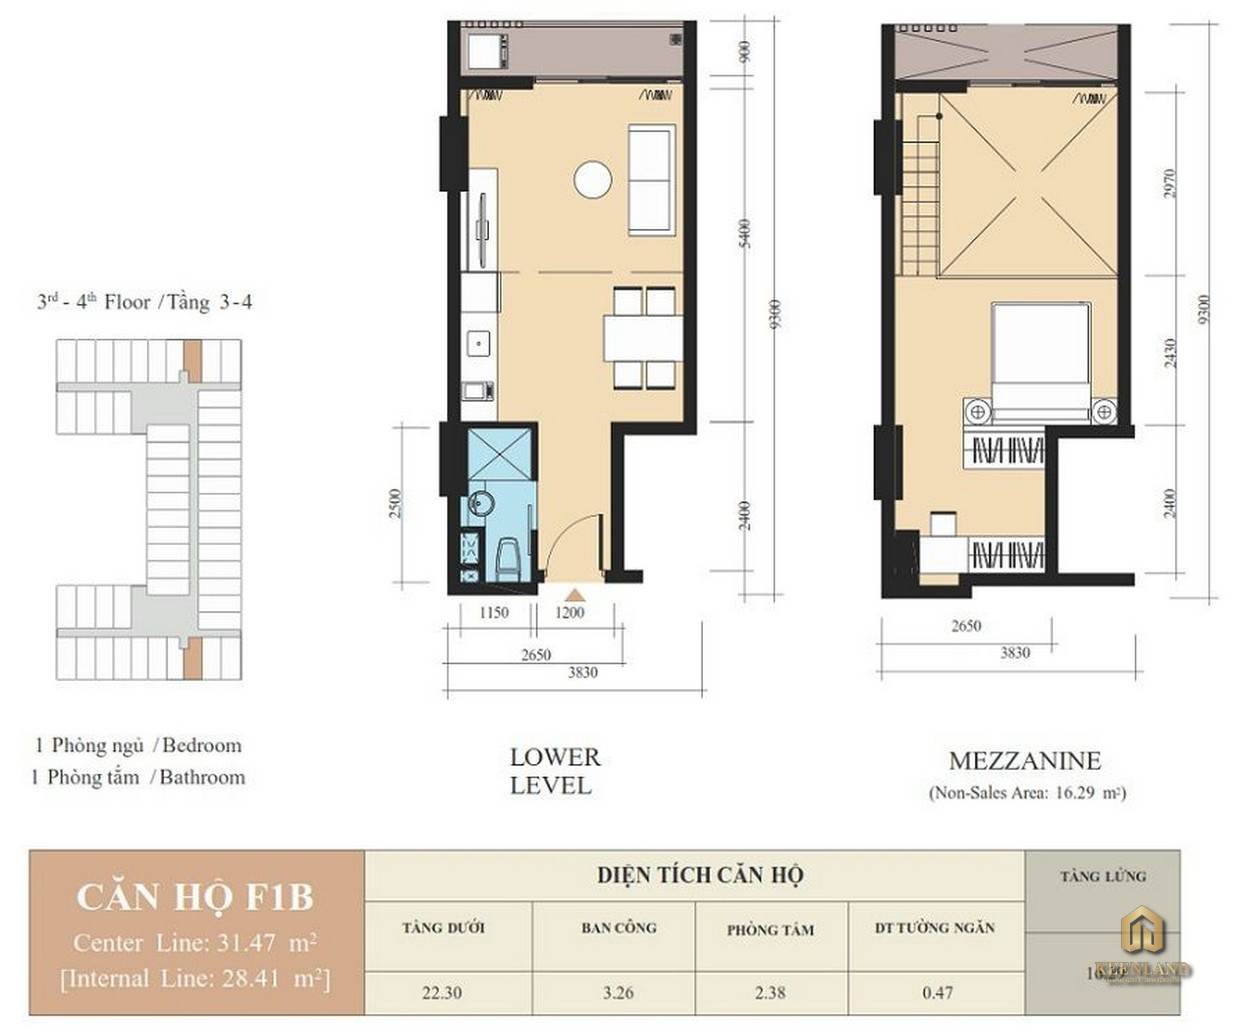 Thiết kế căn hộ F1B